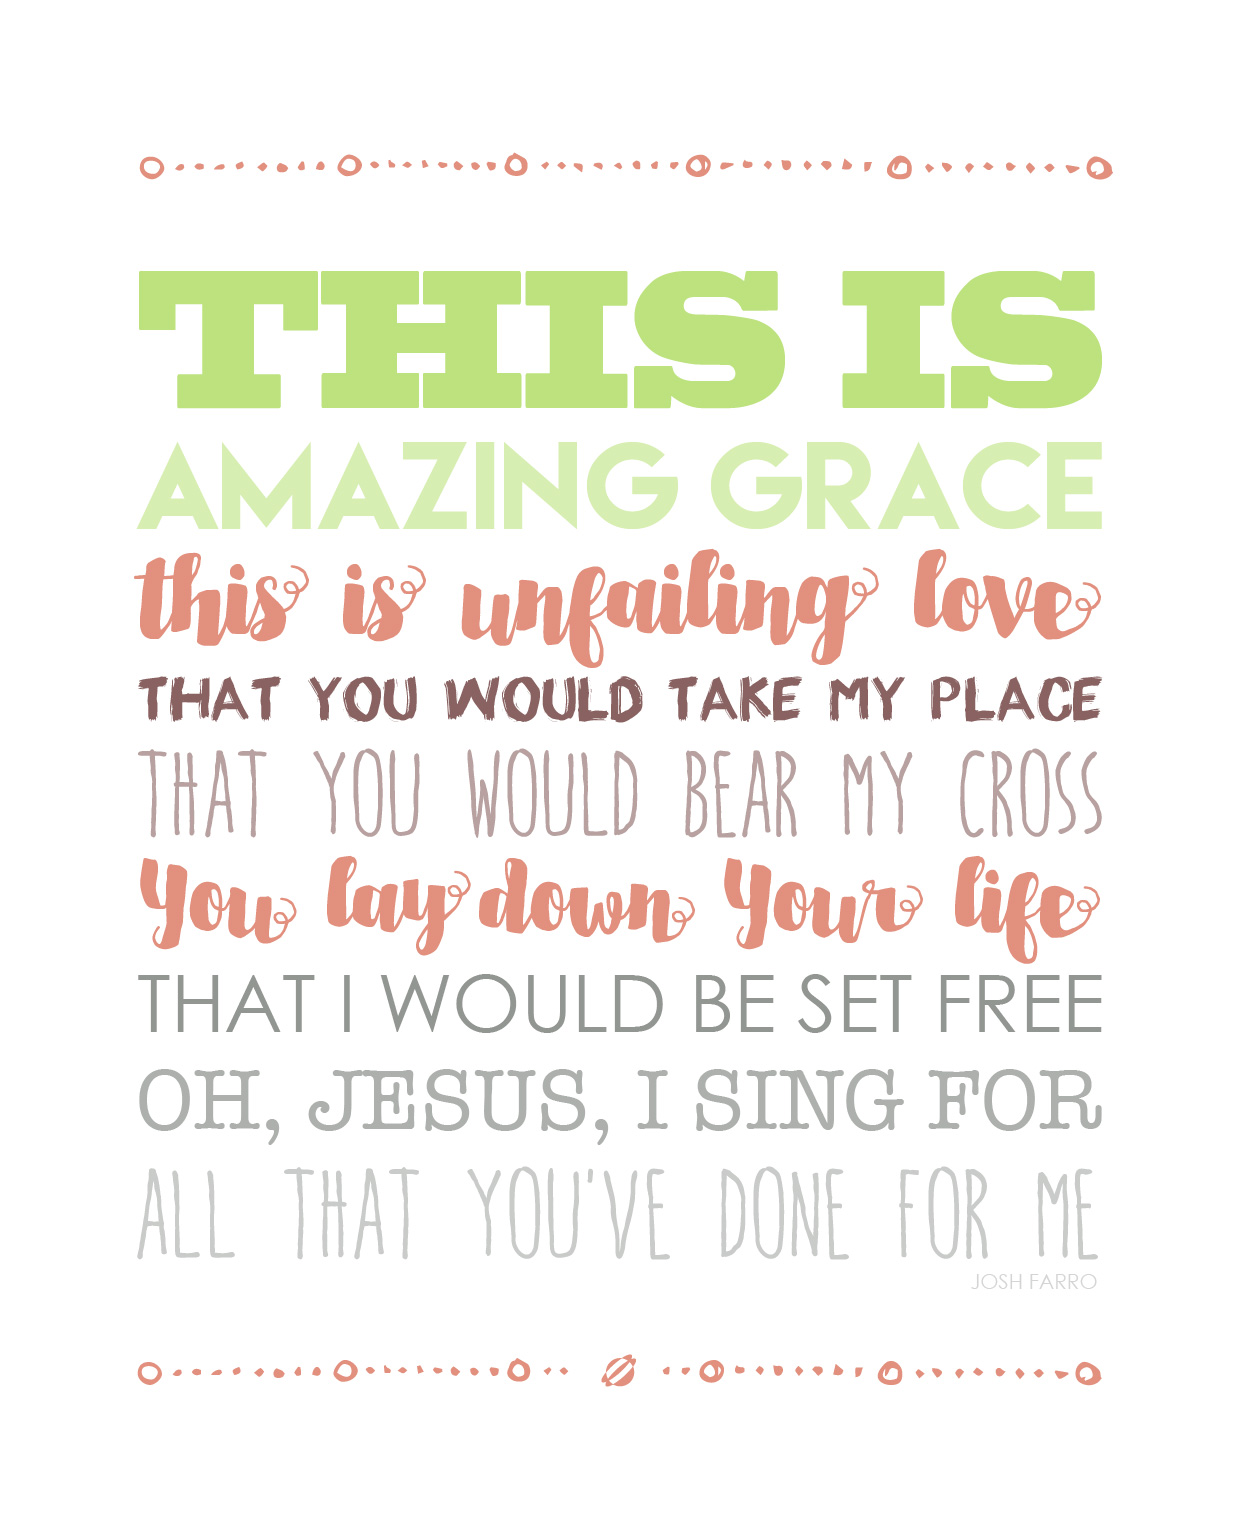 Lostbumblebee Spring Easter Amazing Grace Jesus